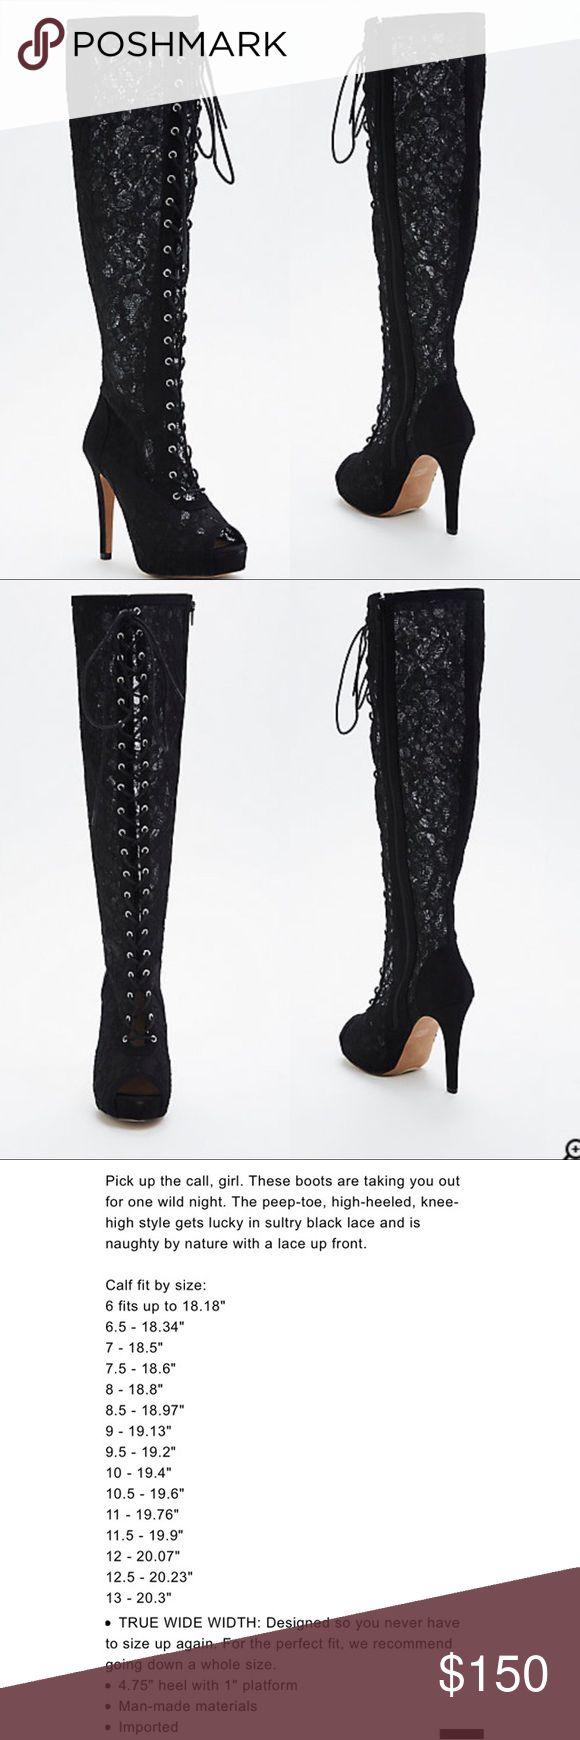 Black Lace Up Heels Torrid Black Lace Heels NEW W/O Box Tag on bottom of Heels Torrid Shoes Heels